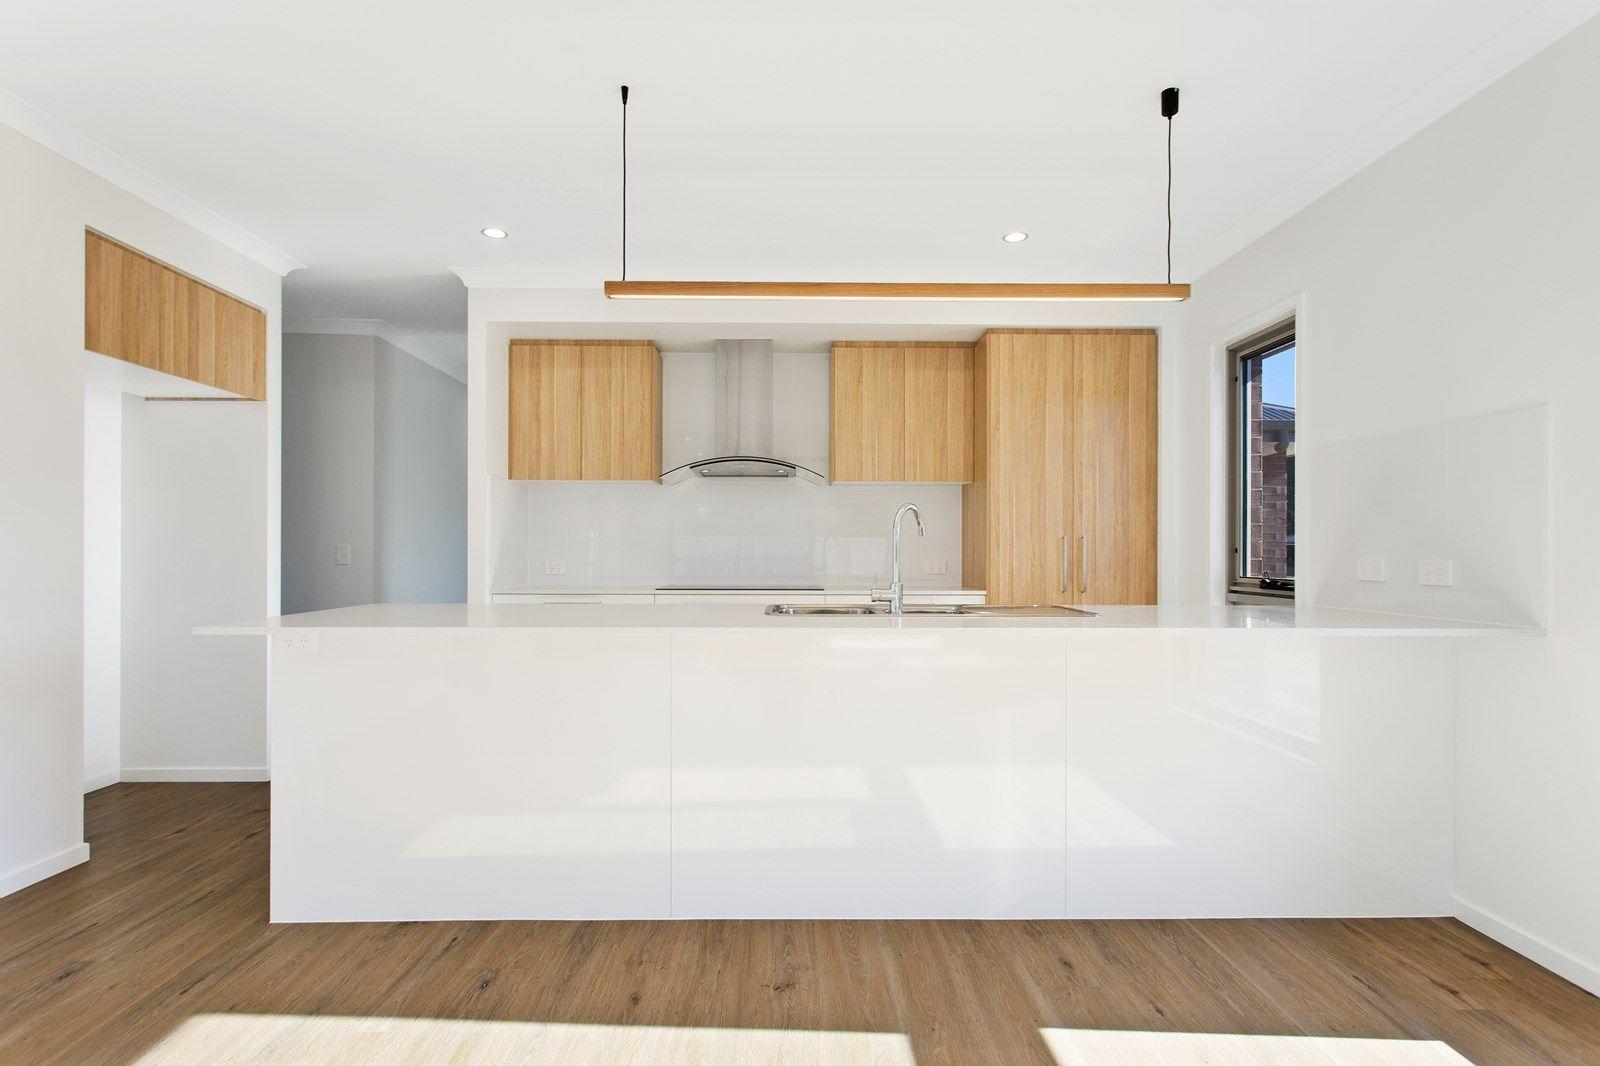 Lot 6 Cedarwood Place, Landsborough QLD 4550, Image 2